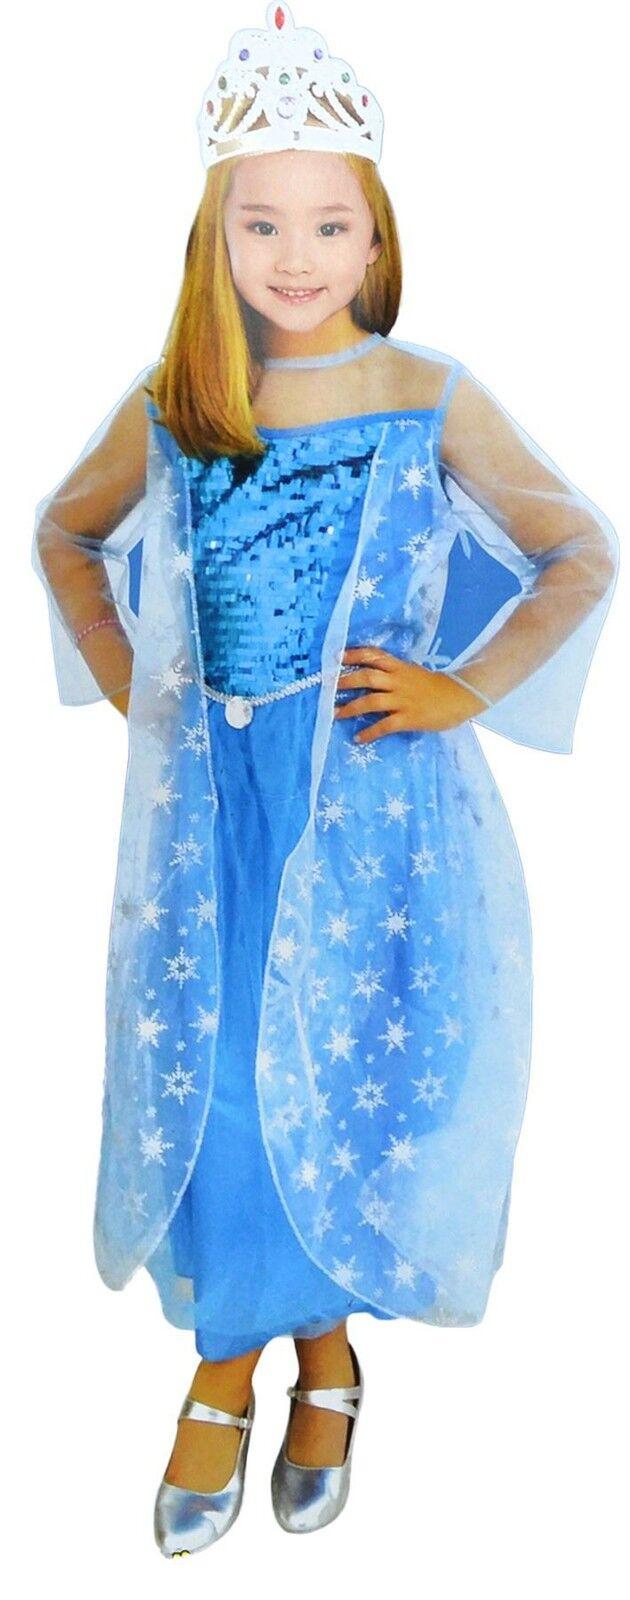 Bermoni Princess Elsa Dressing Up Costume (4 to 6 y.o.)